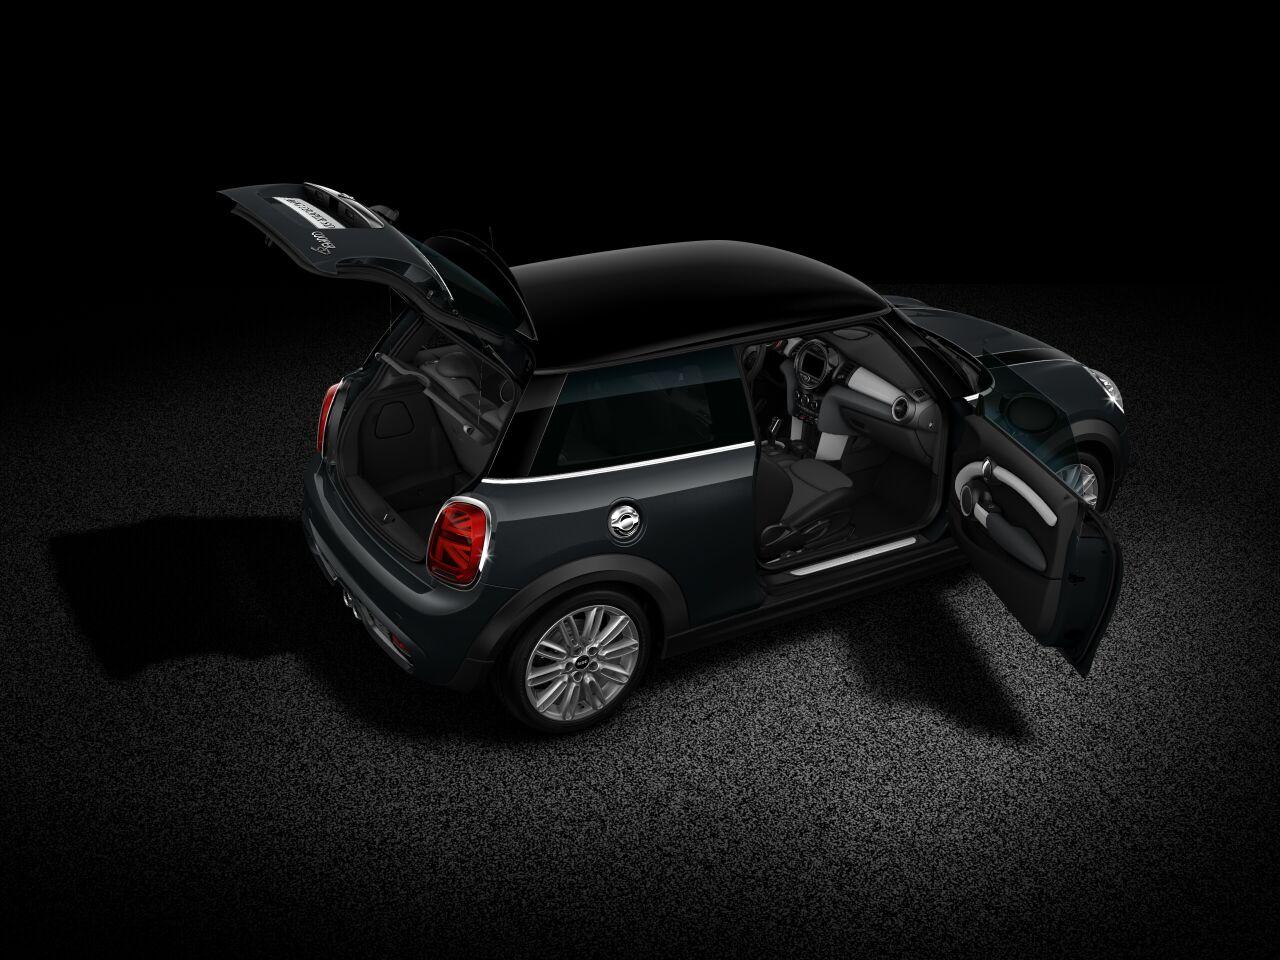 MINI Cooper SD 3-deurs blik in de auto